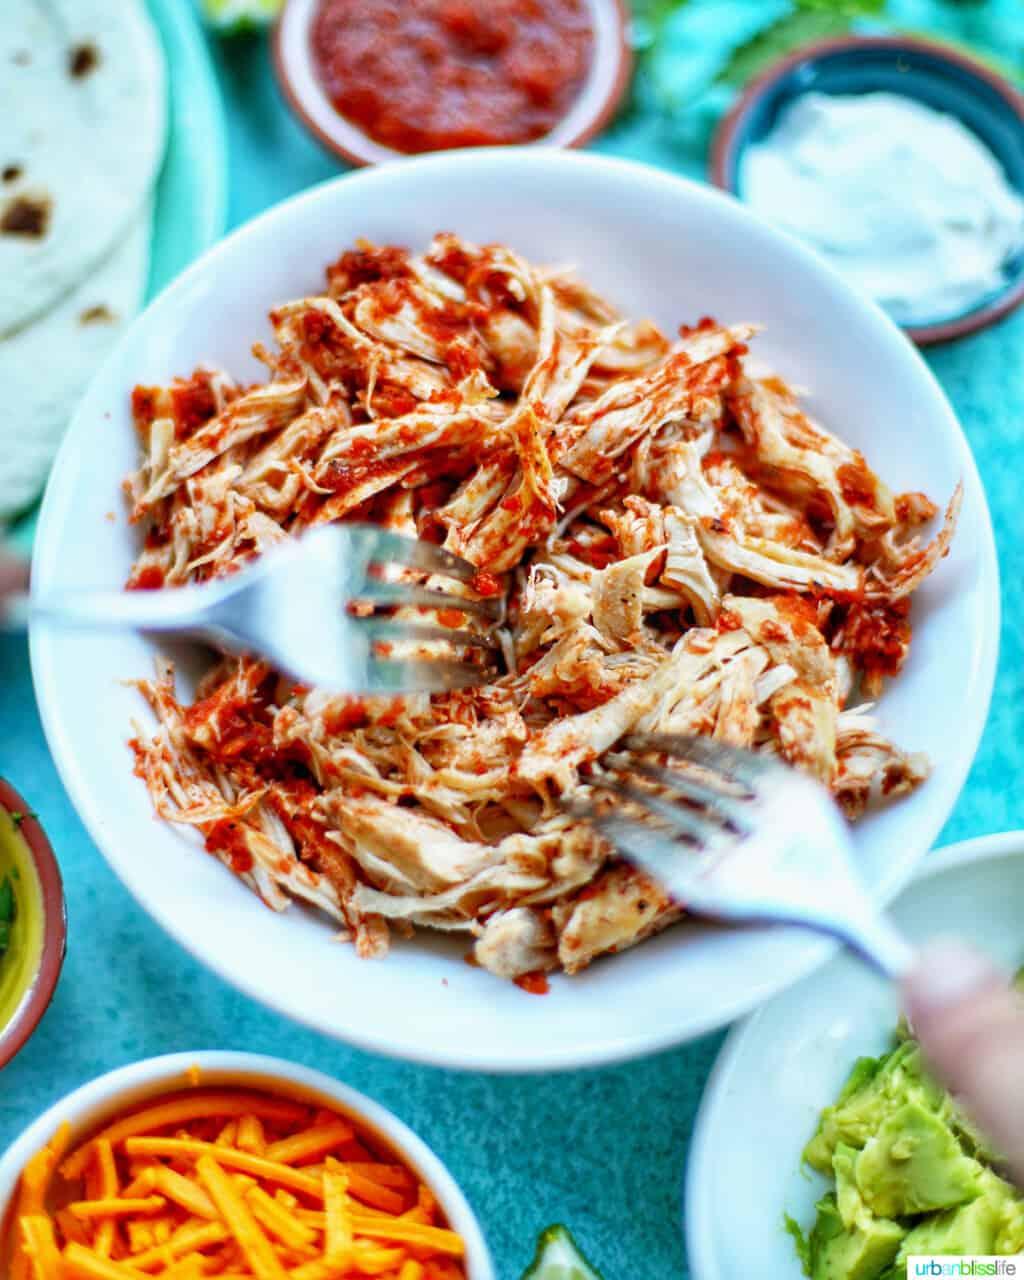 two forks shredding Instant Pot Salsa Chicken